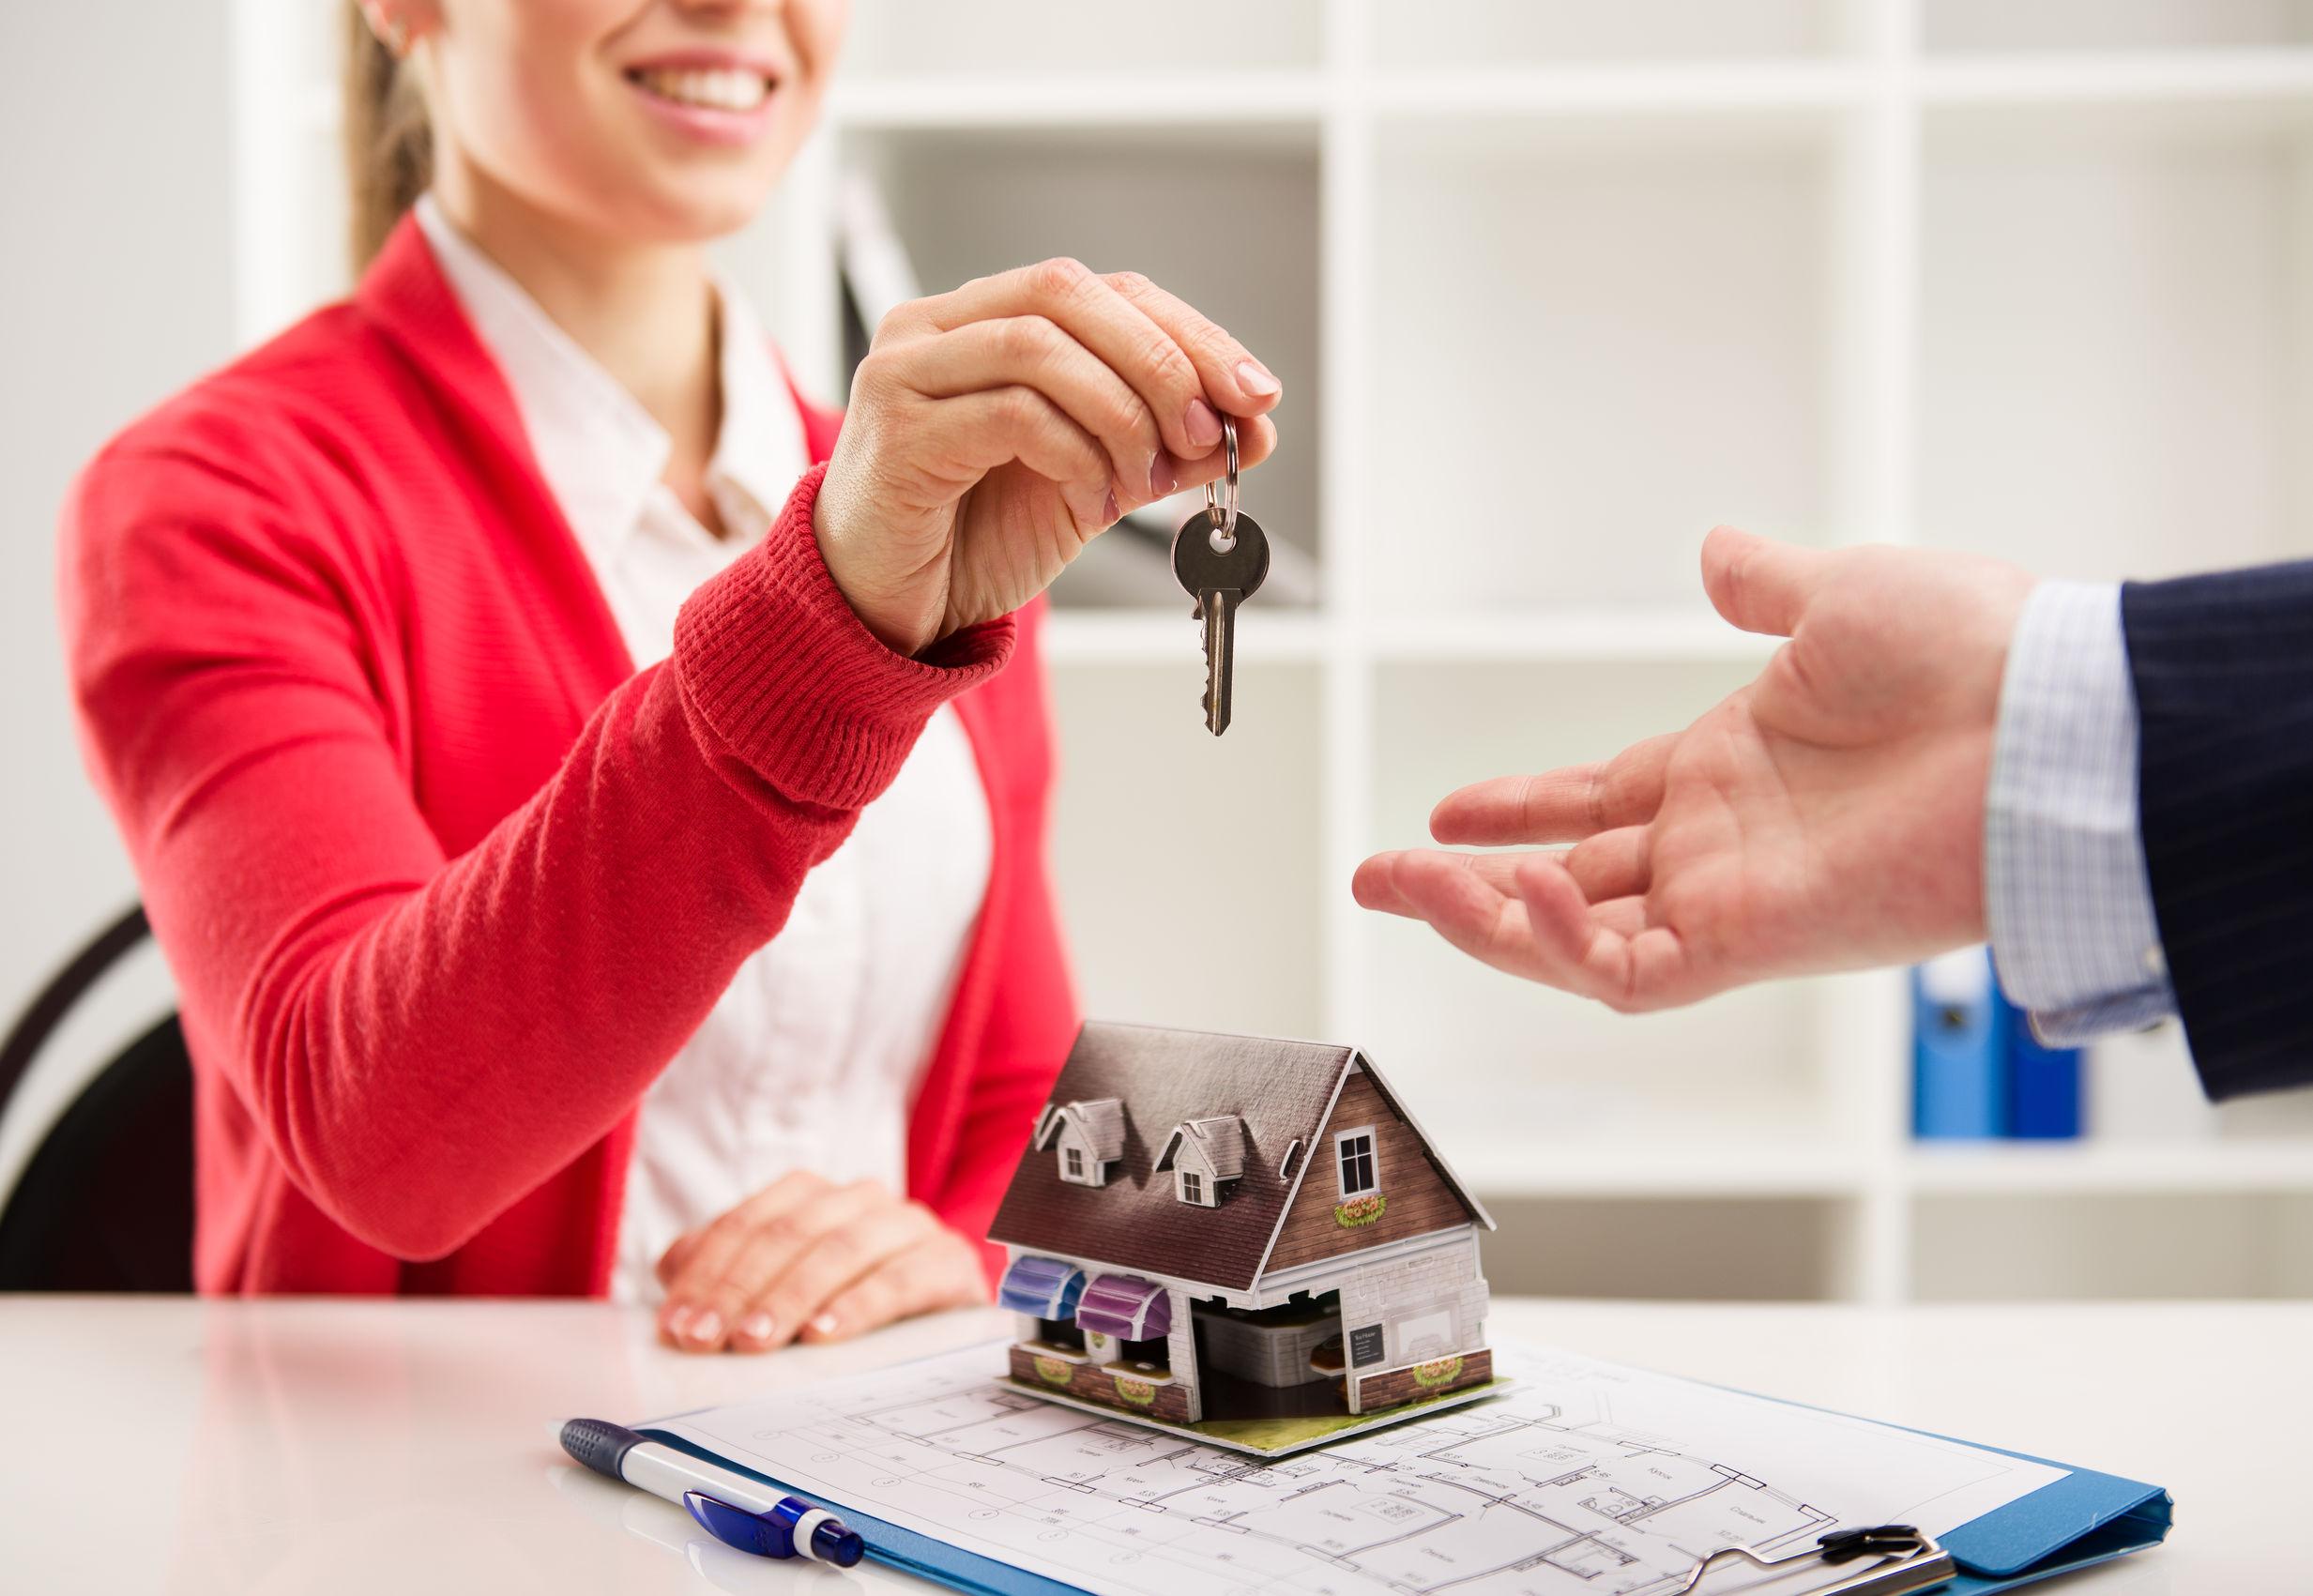 imagen destacada de sector inmobiliario en 2018 en España